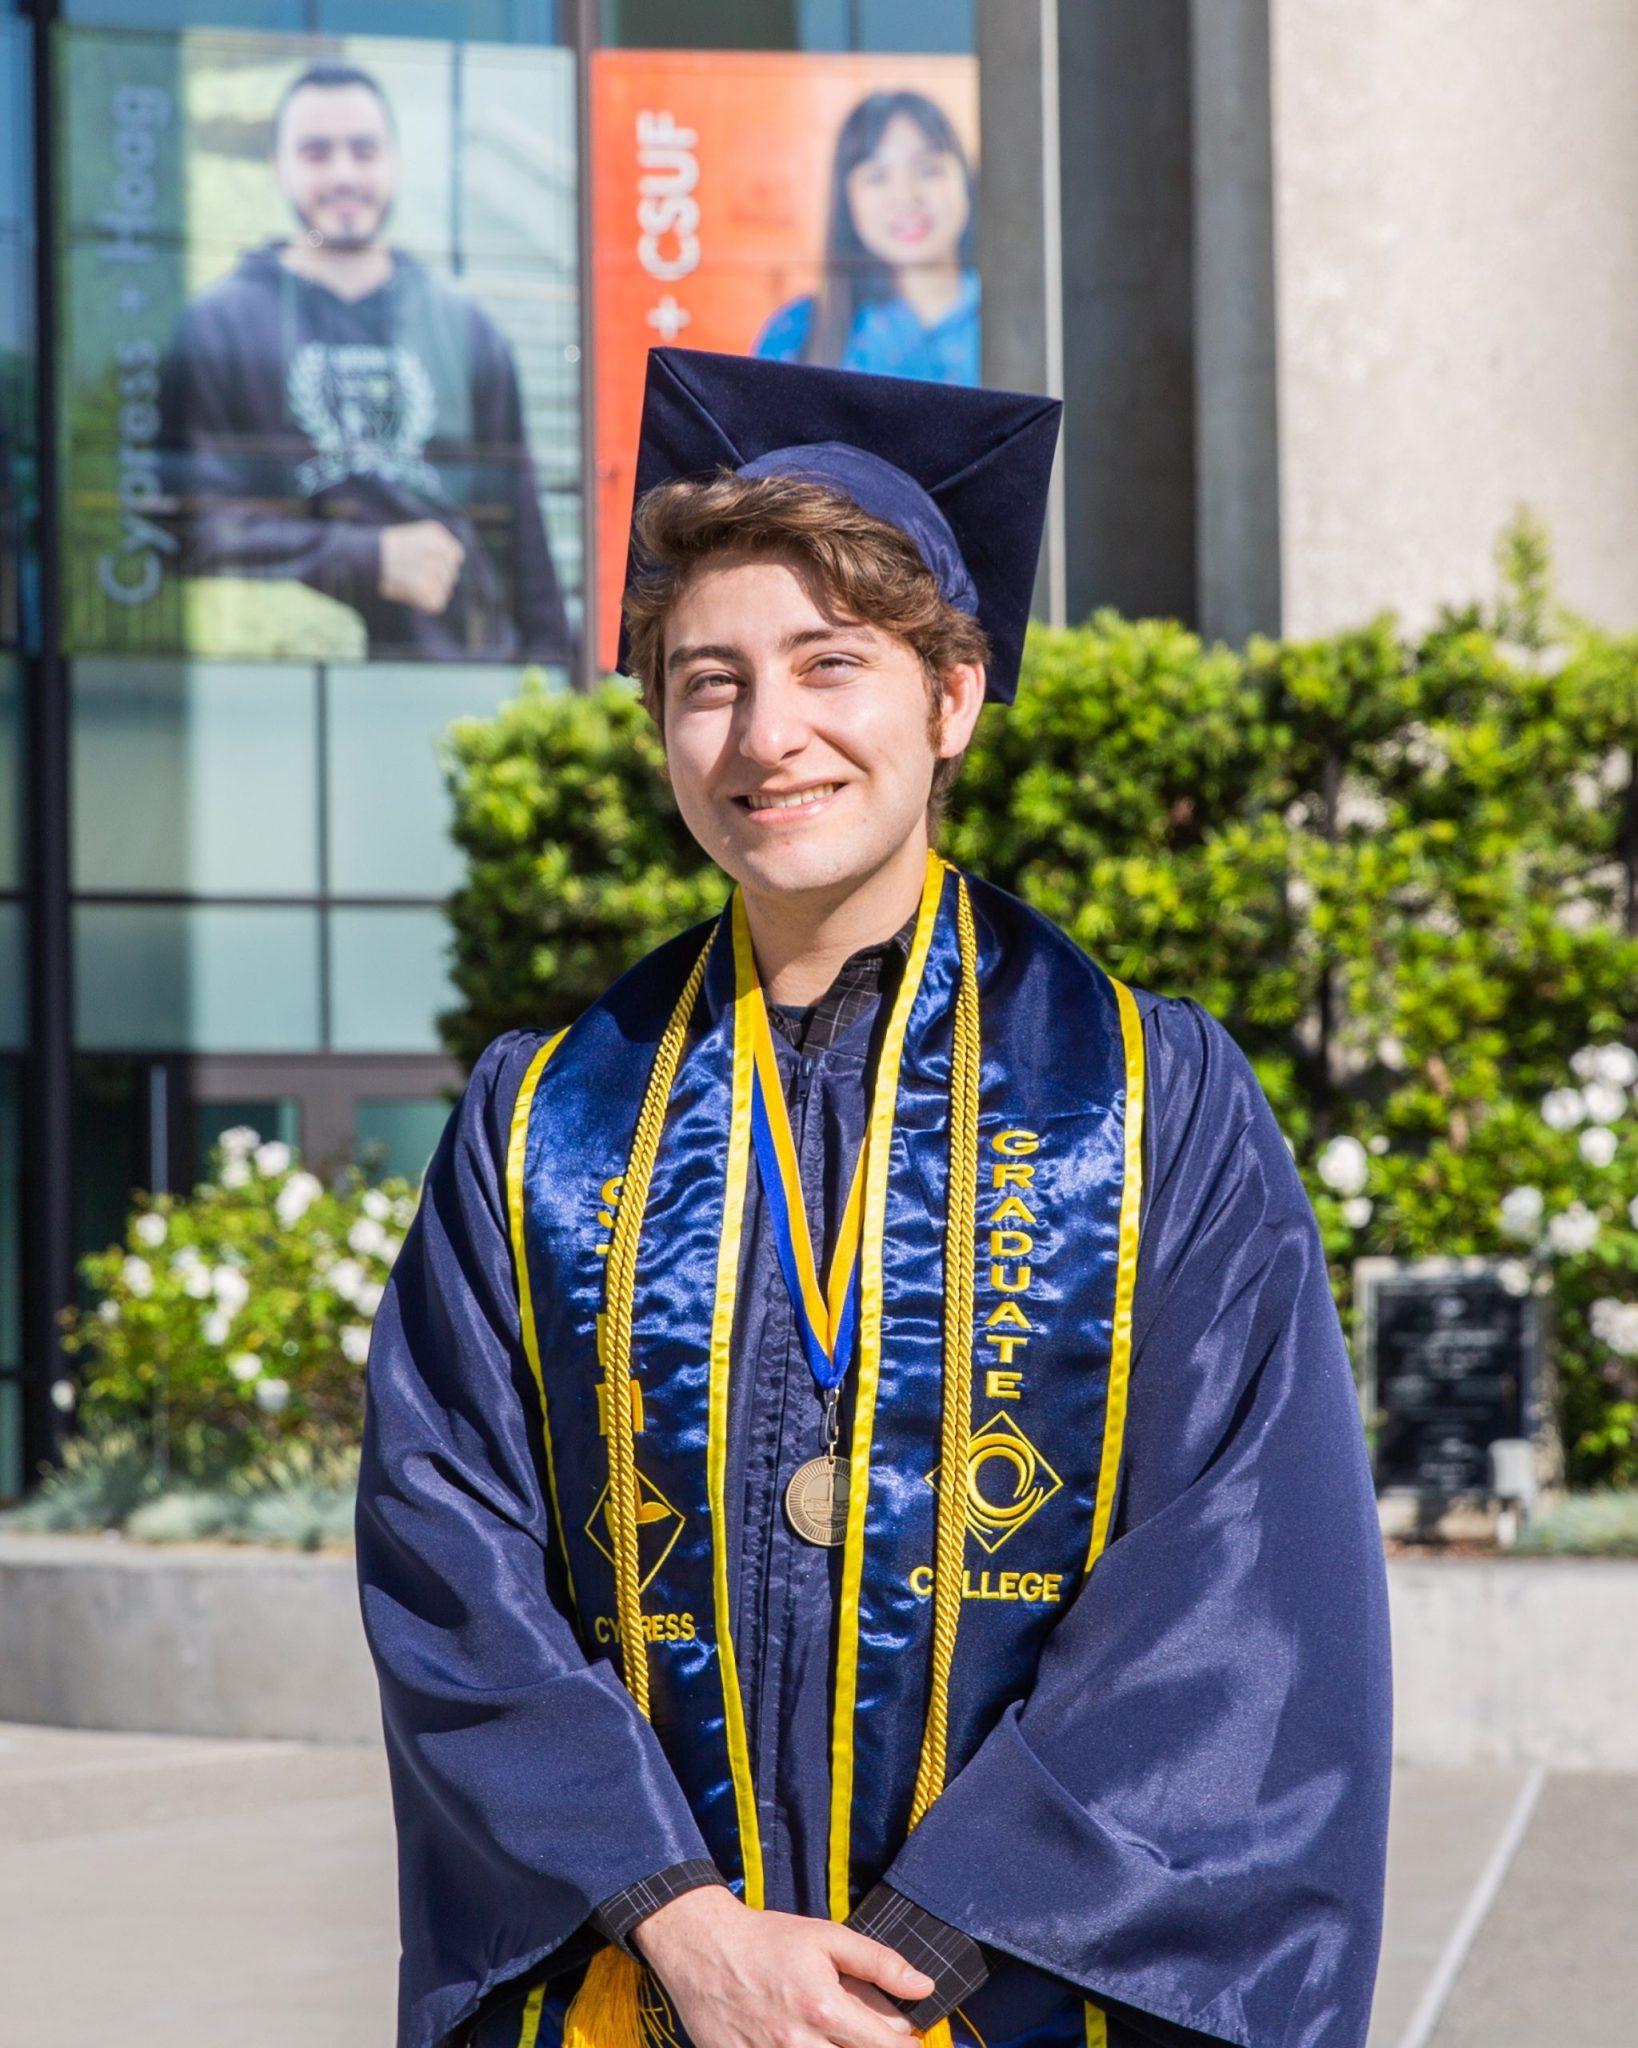 Presidential Scholar of Distinction, Connor Kilzer, Science, Engineering, Mathematics